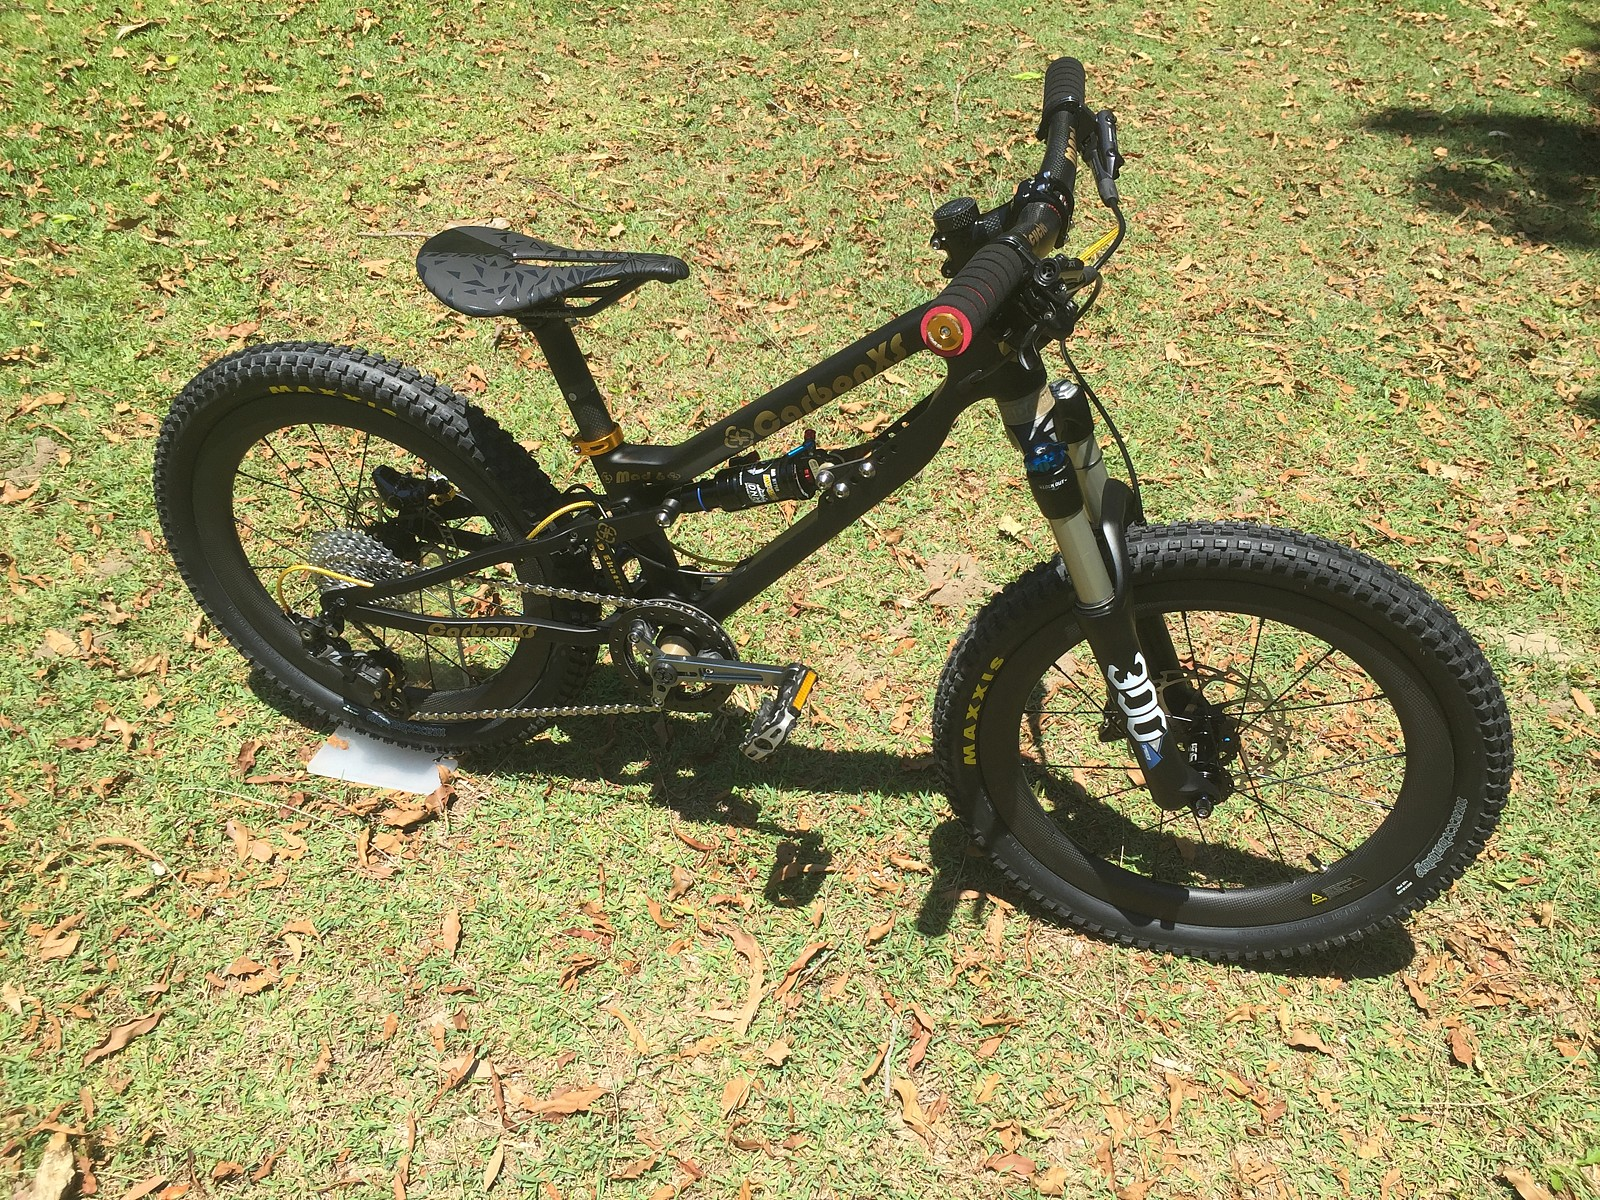 IMG 4187 - CarbonXScycles - Mountain Biking Pictures - Vital MTB